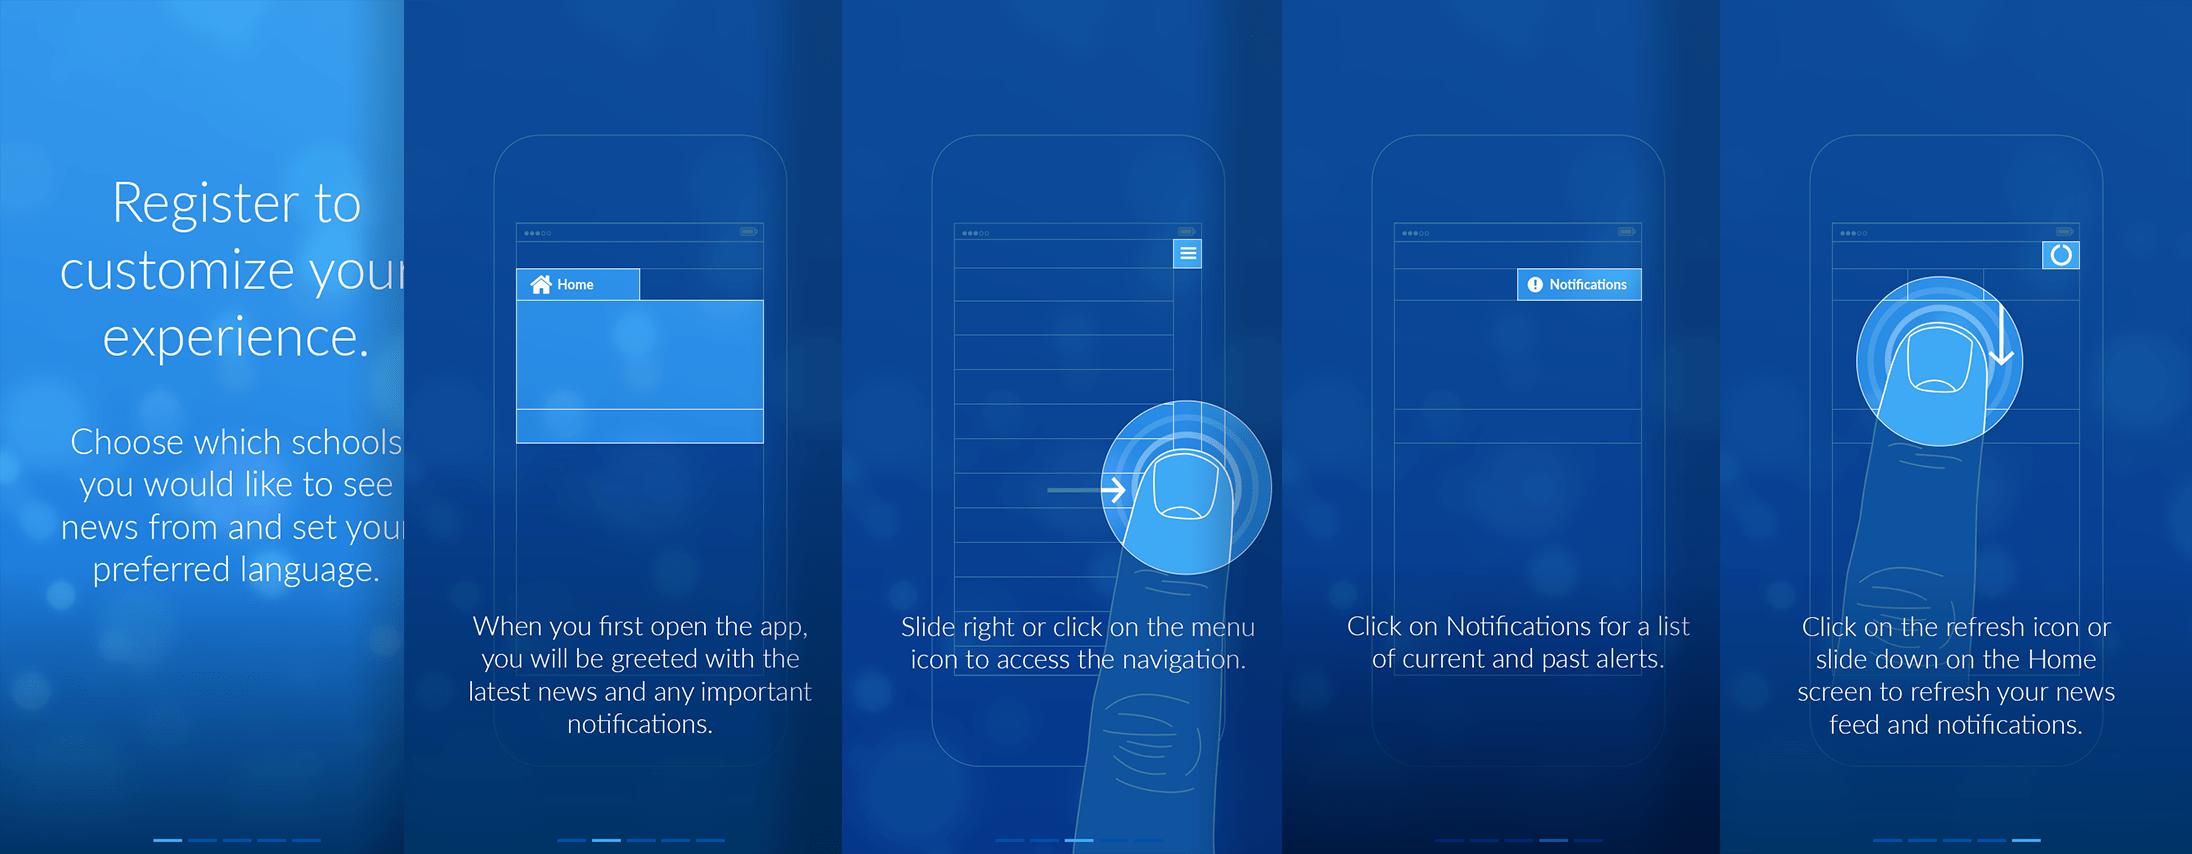 K-12 Mobile Application Help Screens